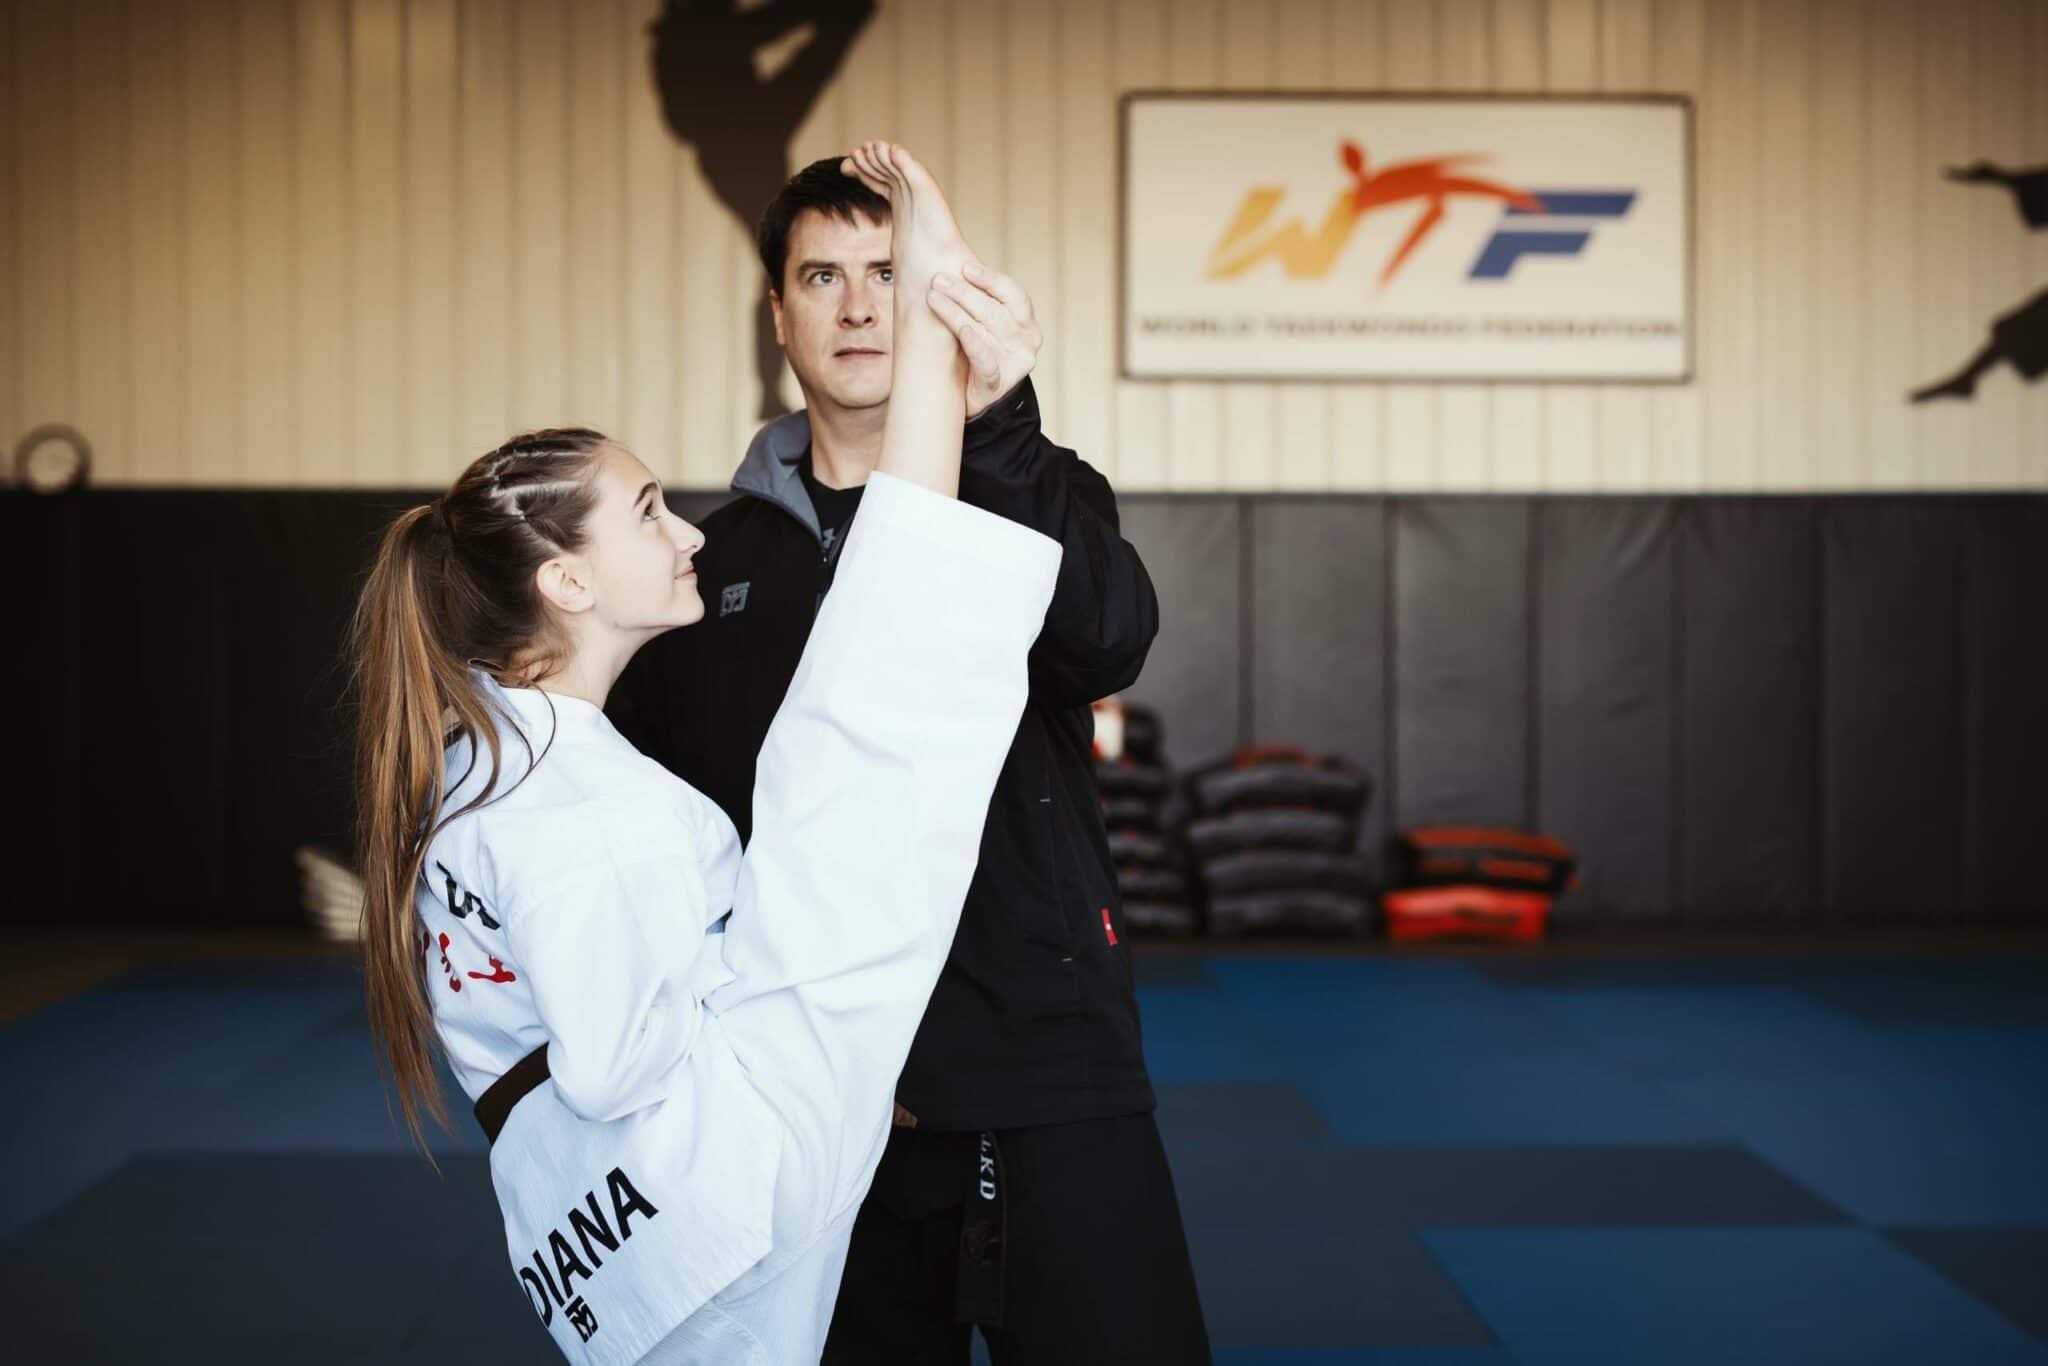 Total Taekwondo Why Martial Arts? image